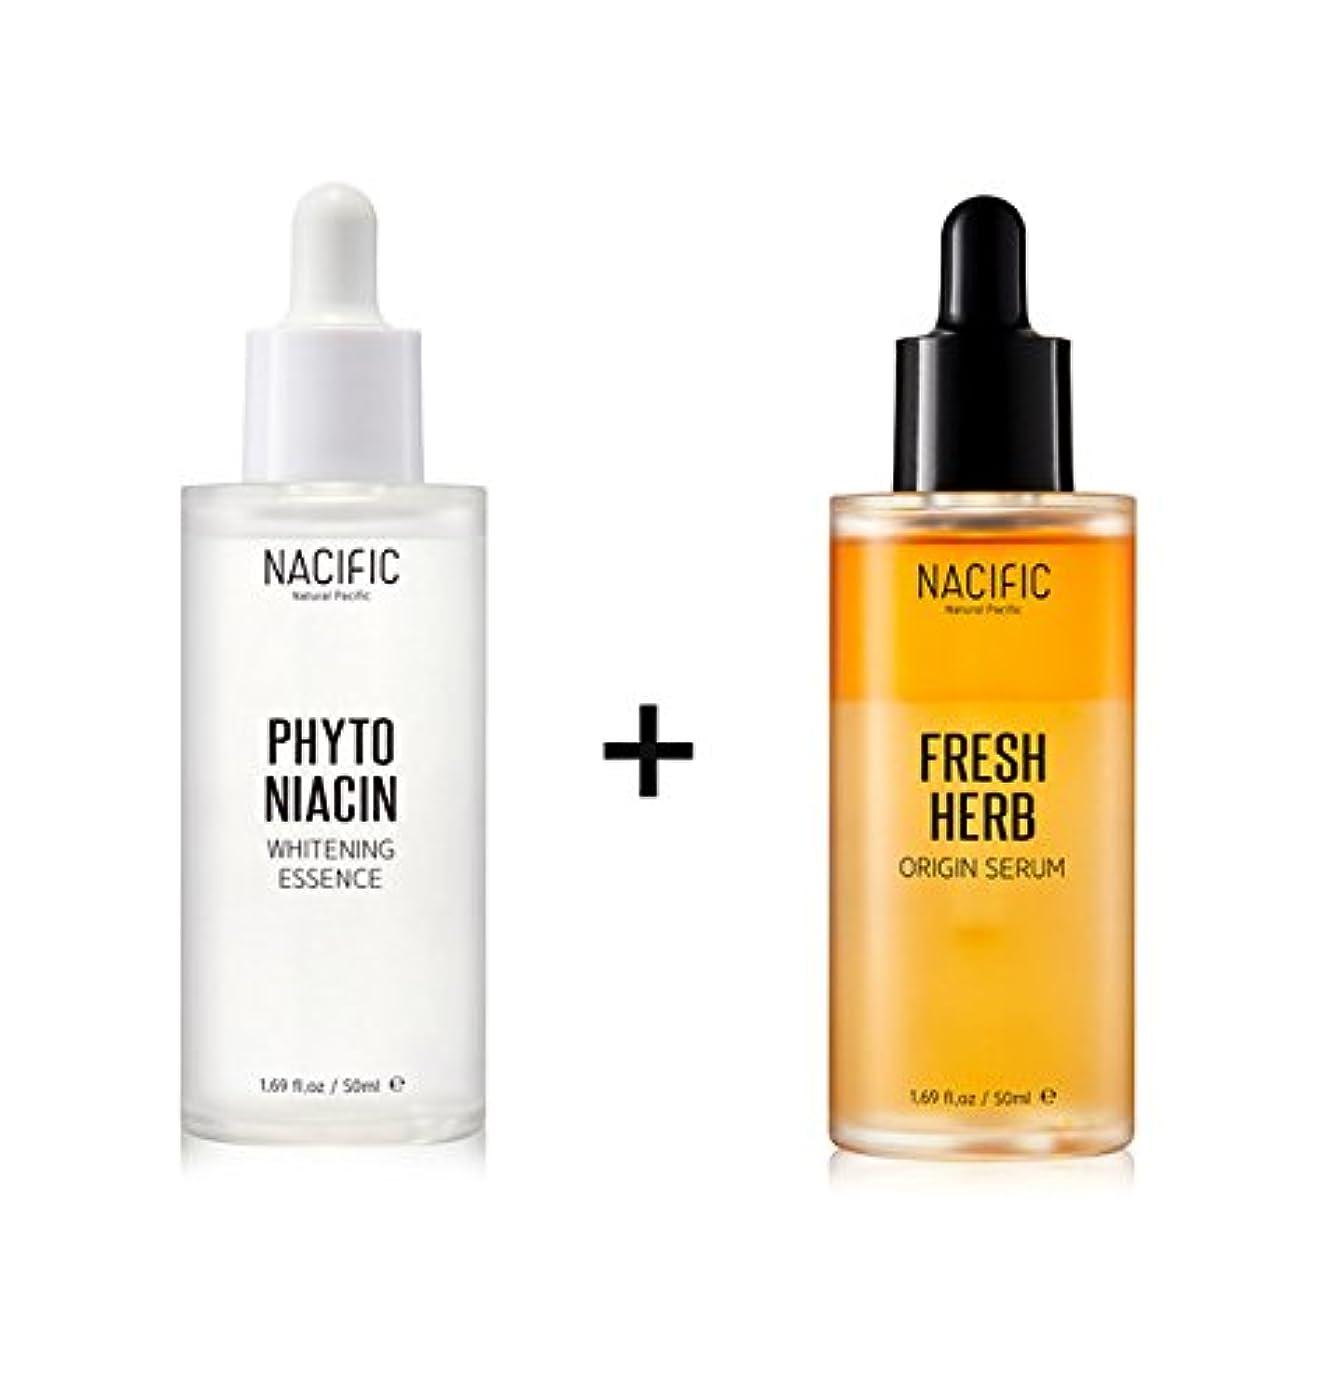 [Renewal] NACIFIC Fresh Herb Origin Serum 50ml + Phyto Niacin Whitening Essence 50ml/ナシフィック フレッシュ ハーブ オリジン セラム...